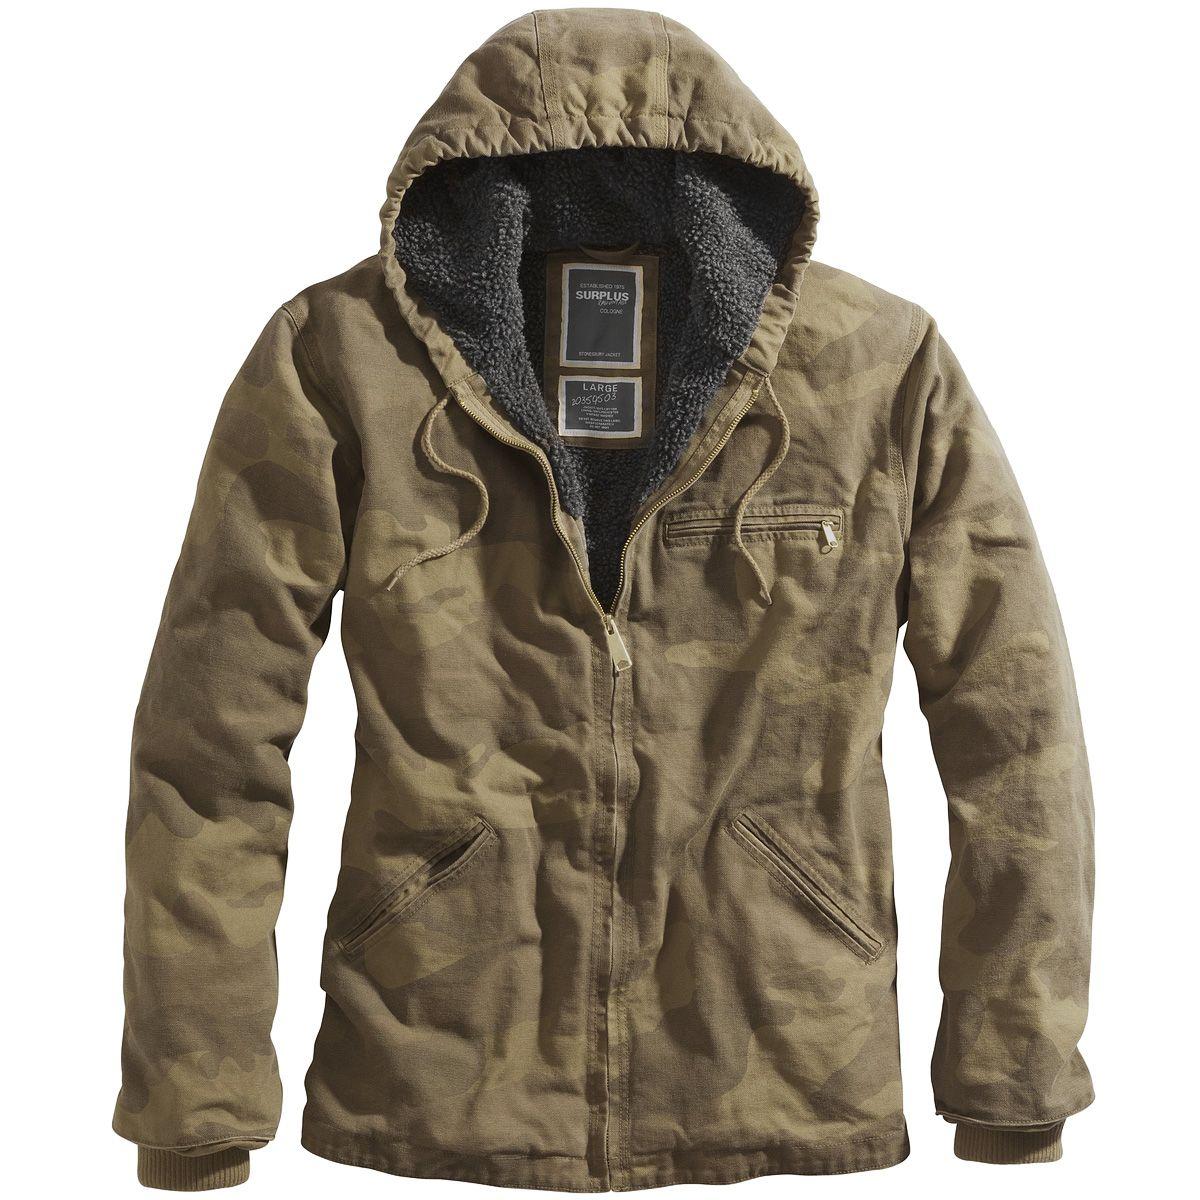 Surplus Stonesbury Jacket in Woodland camo. Simple & comfortable, with  large hood, warm